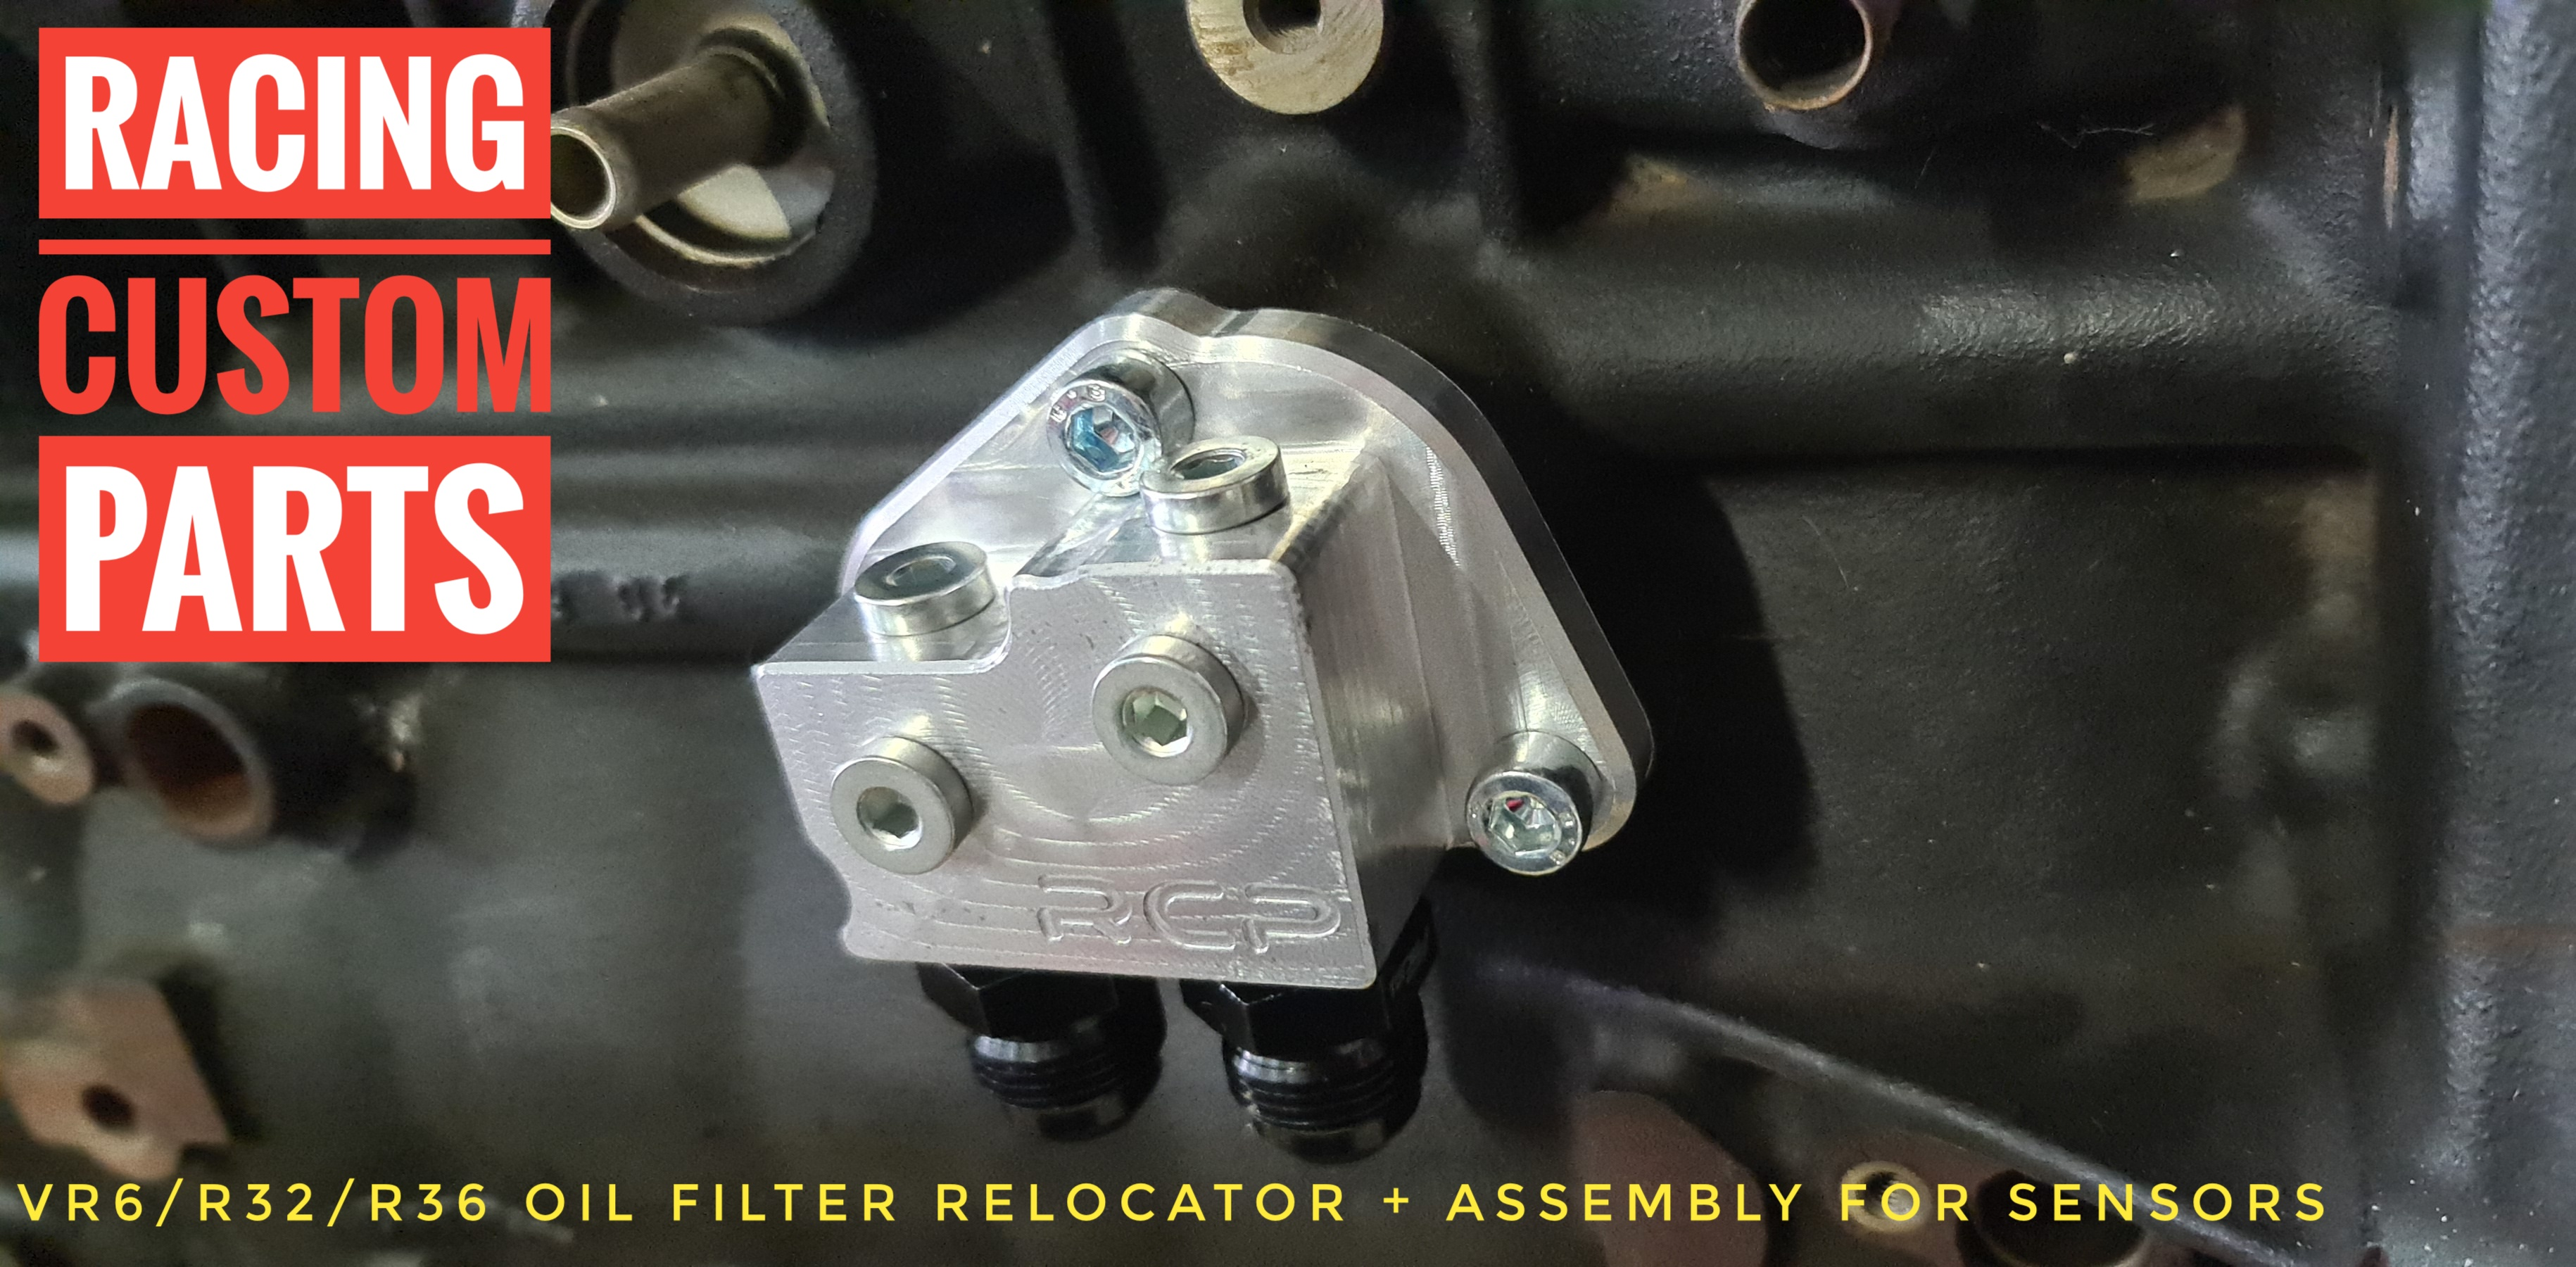 vr6 r32 r36 oil filter relocator oil pressure sensor oil temperature temp sensor racing custom parts billet cnc